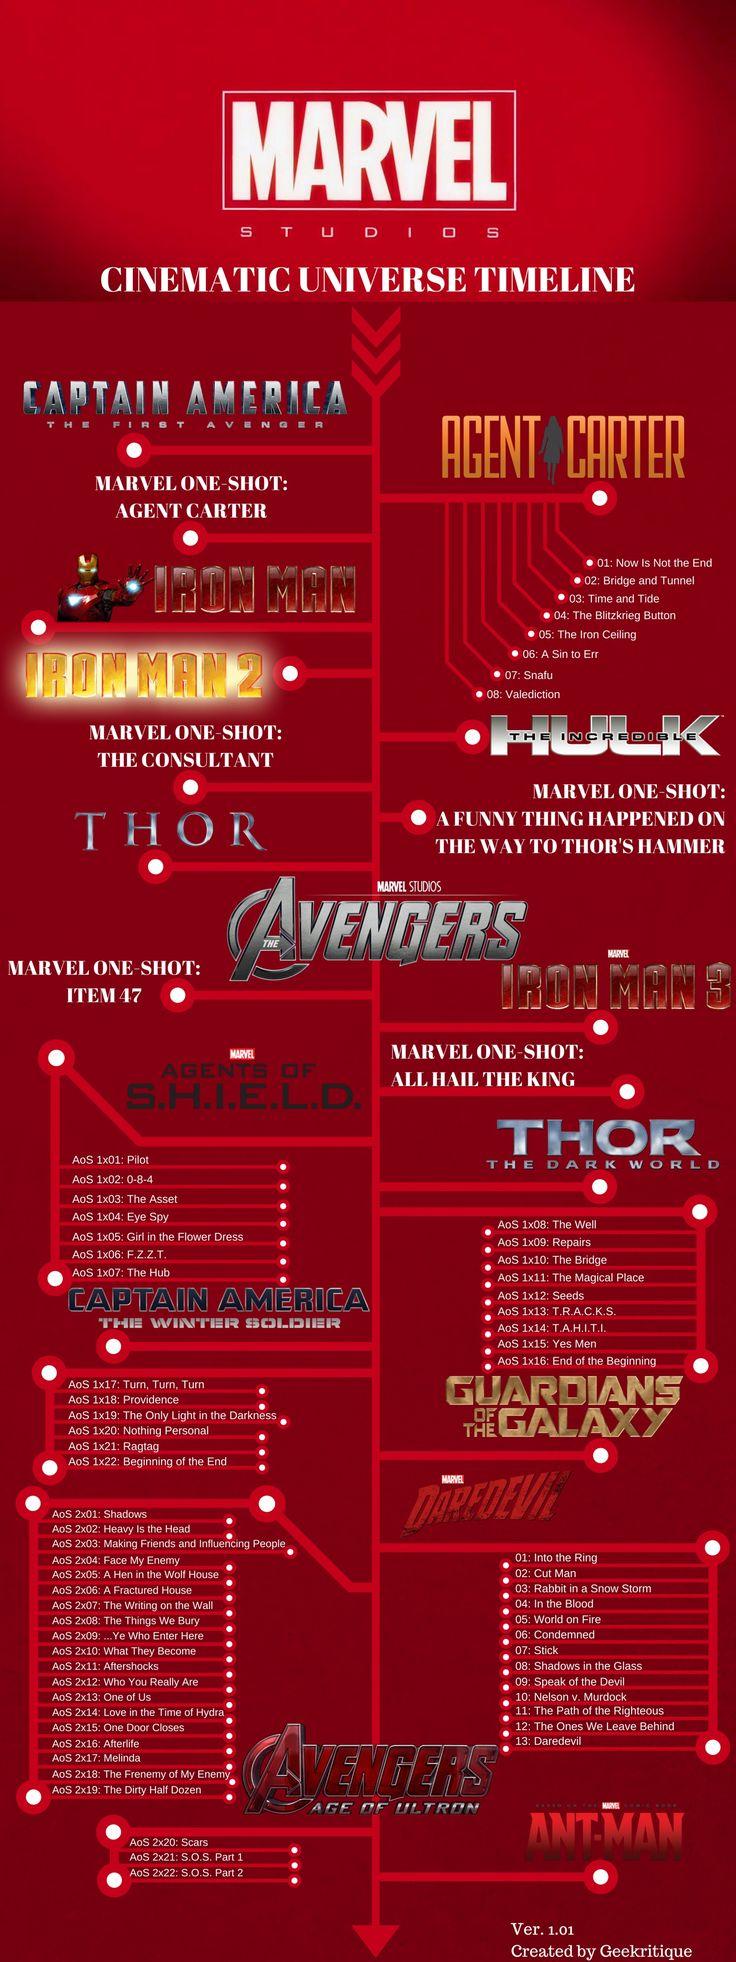 The Marvel Cinematic Universe Chronological Timeline. More useful information…